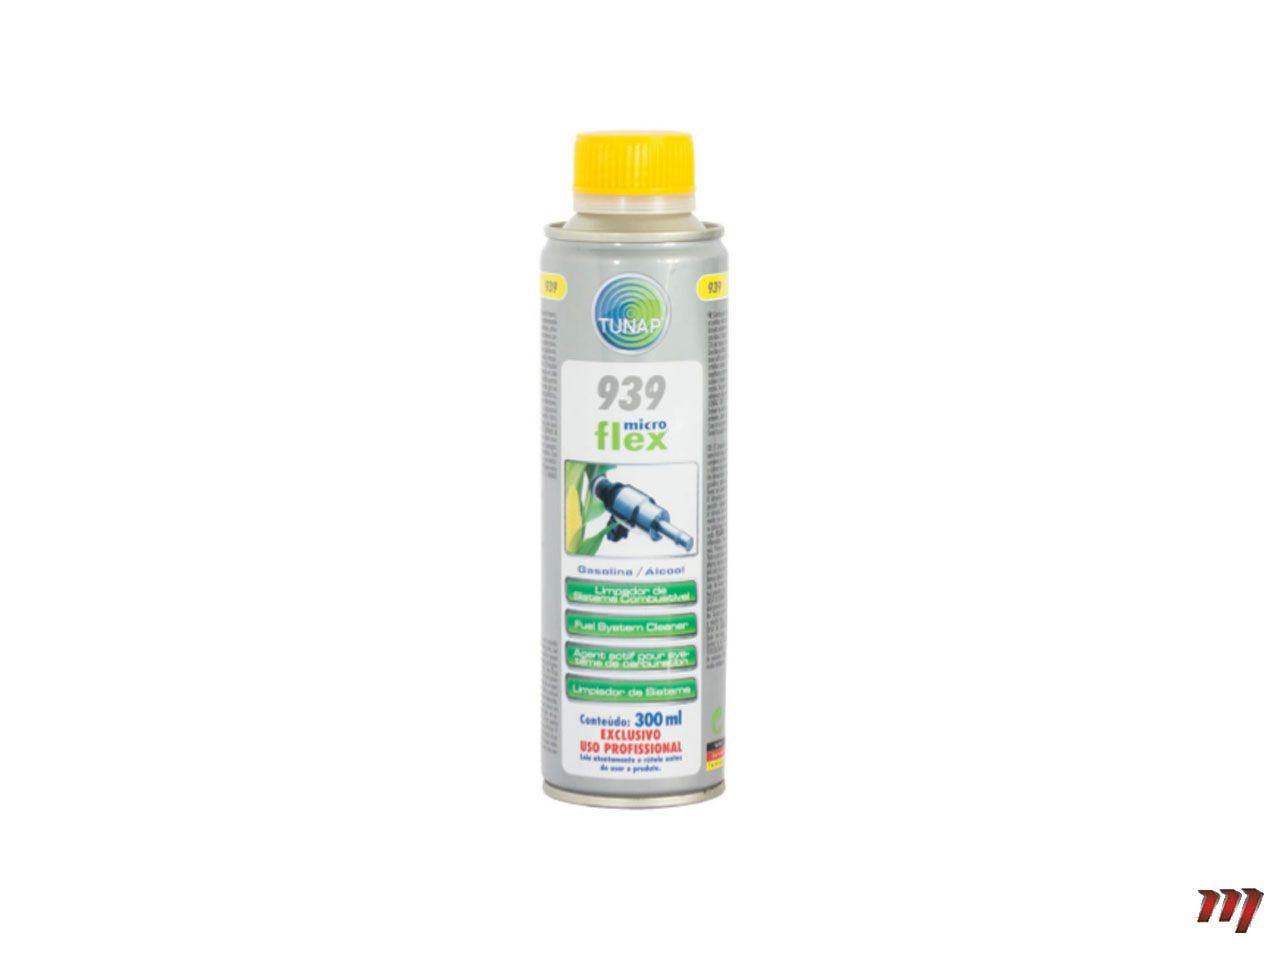 Limpeza do Sistema Gasolina/Etanol E5-E100 Tunap 939  - Mirai Peças Toyota